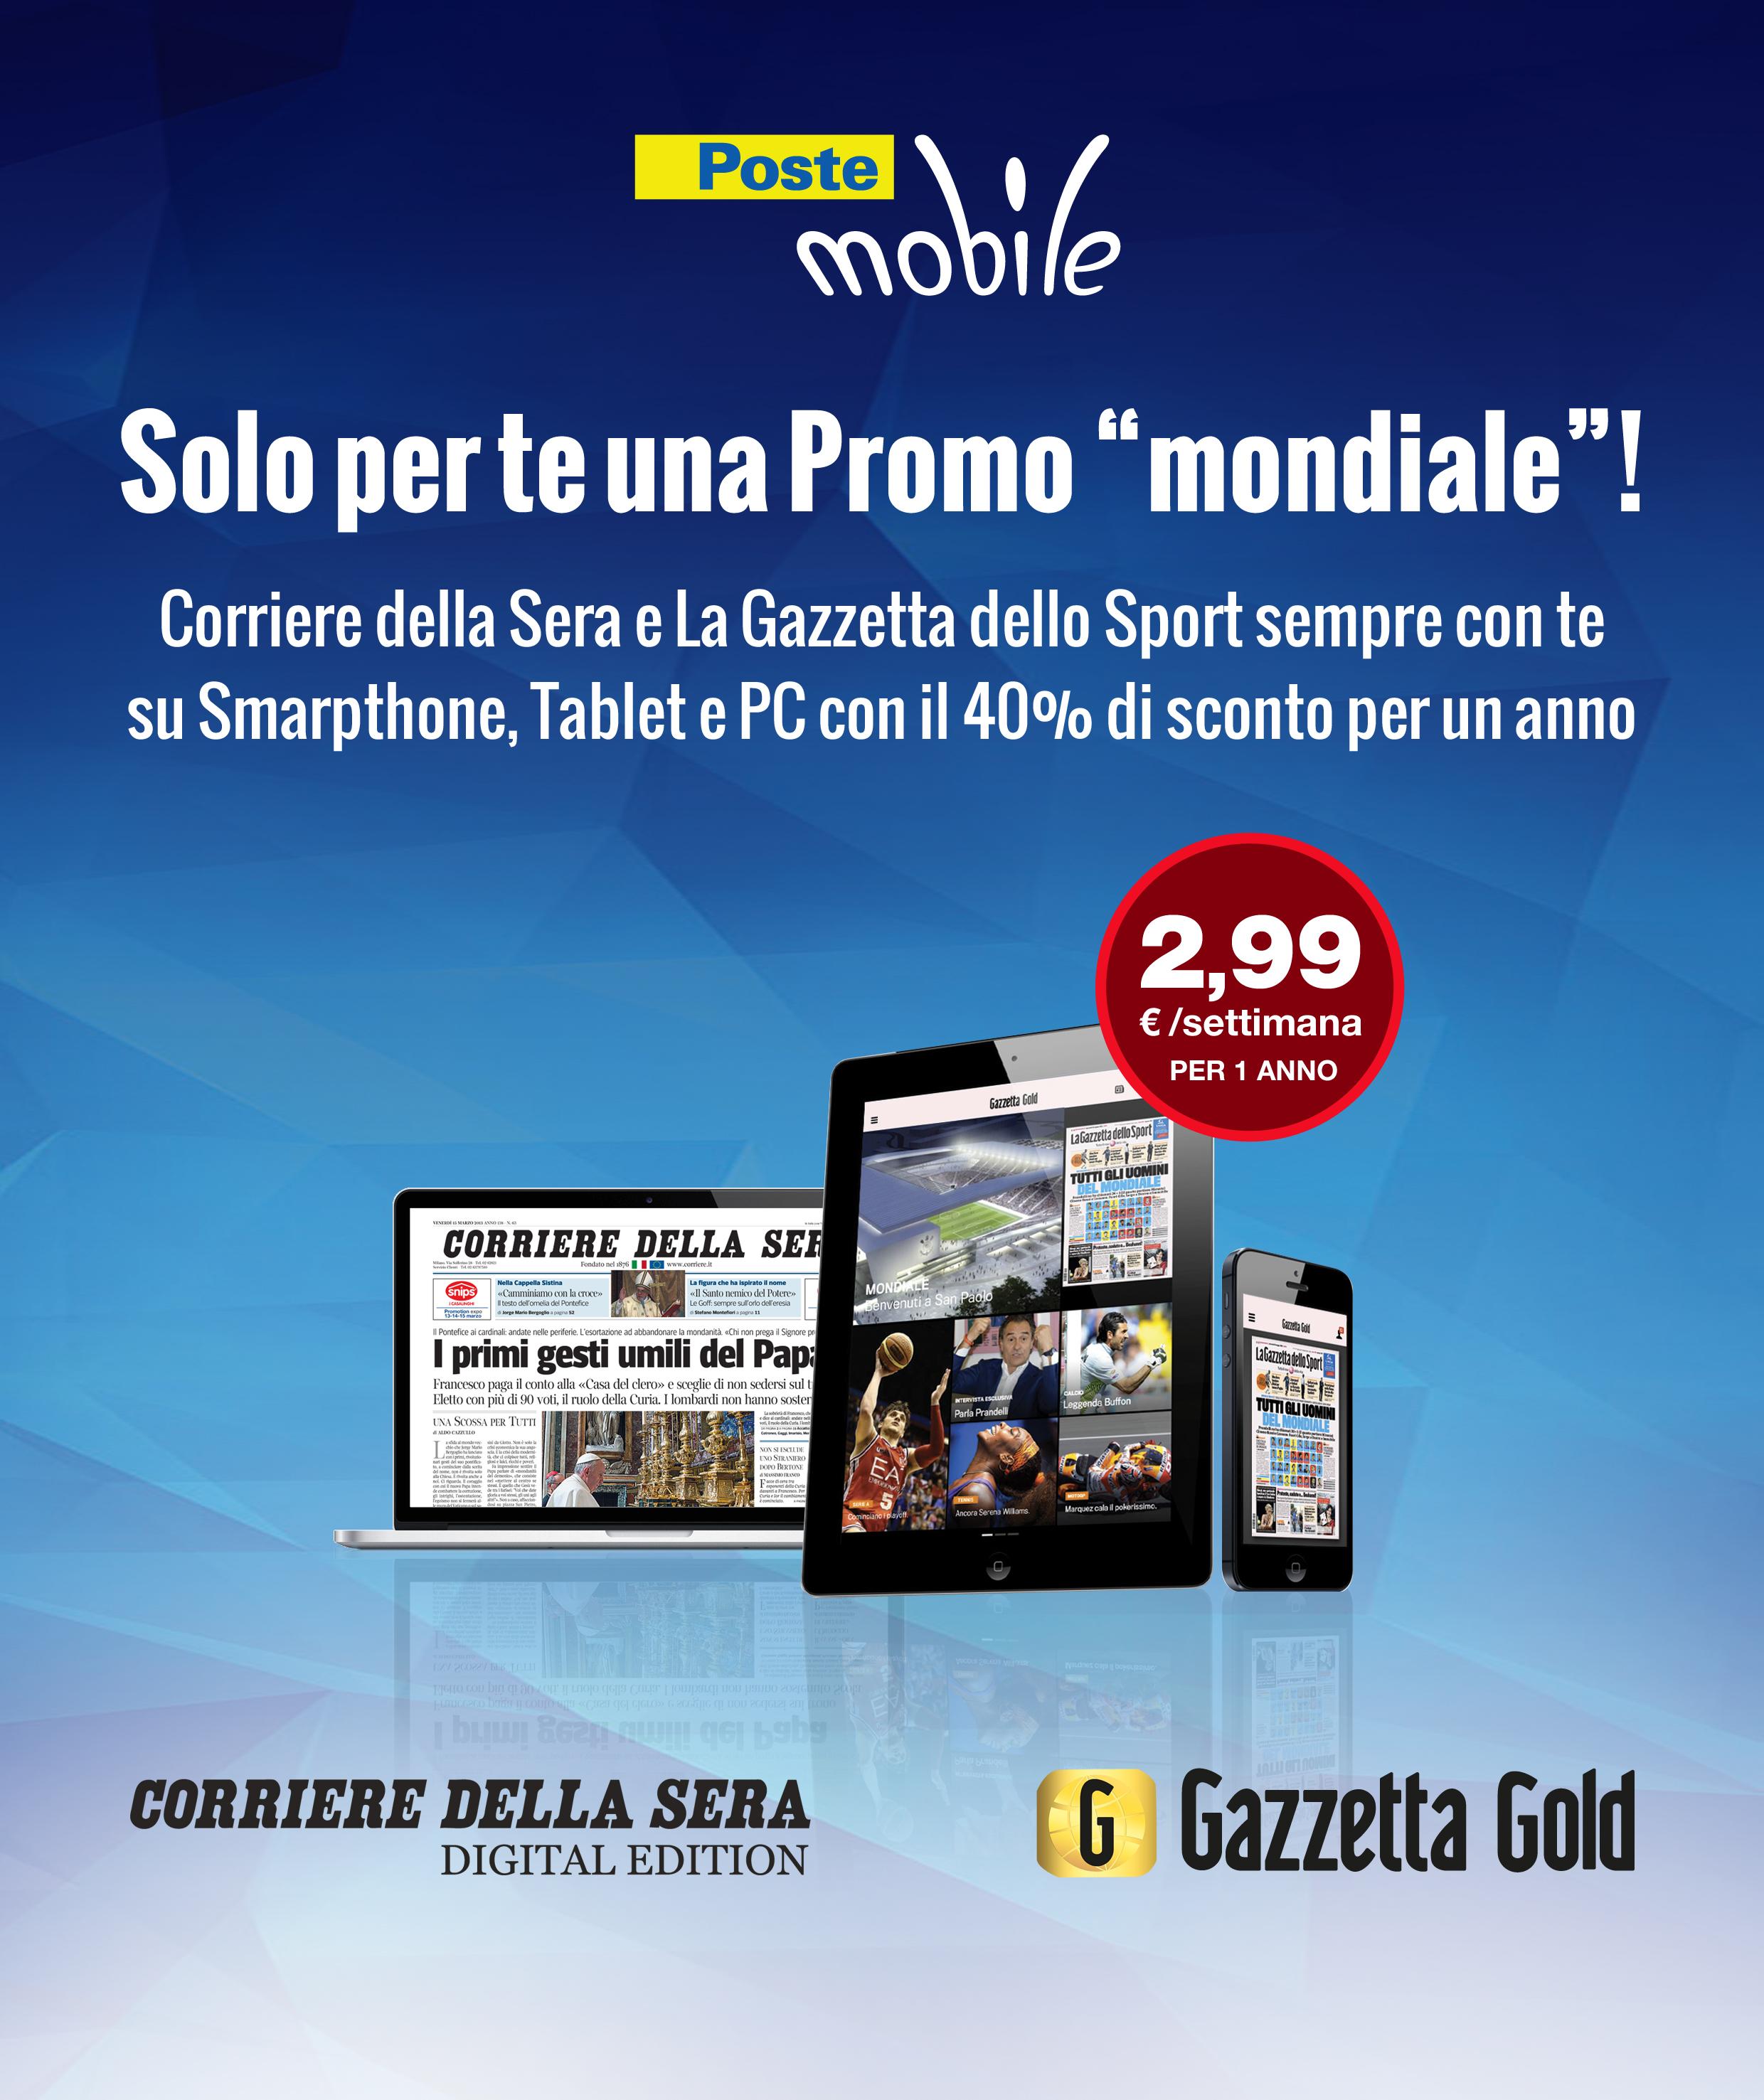 PosteMobile promo mondiale Gazzetta